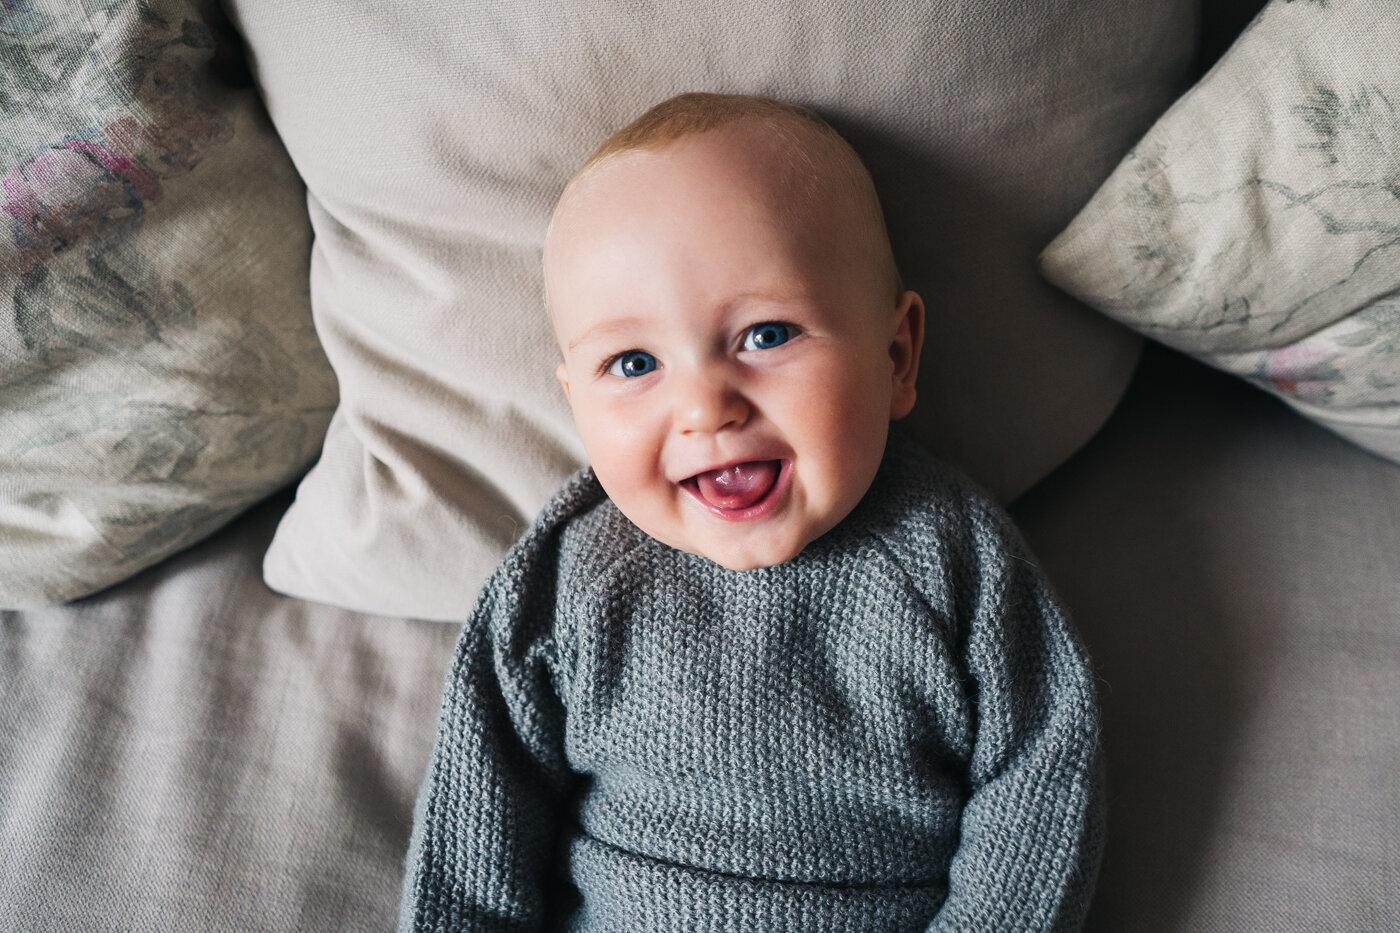 family-photography-teesside-north-yorkshire-newborn-baby-family-shoot-0005.jpg